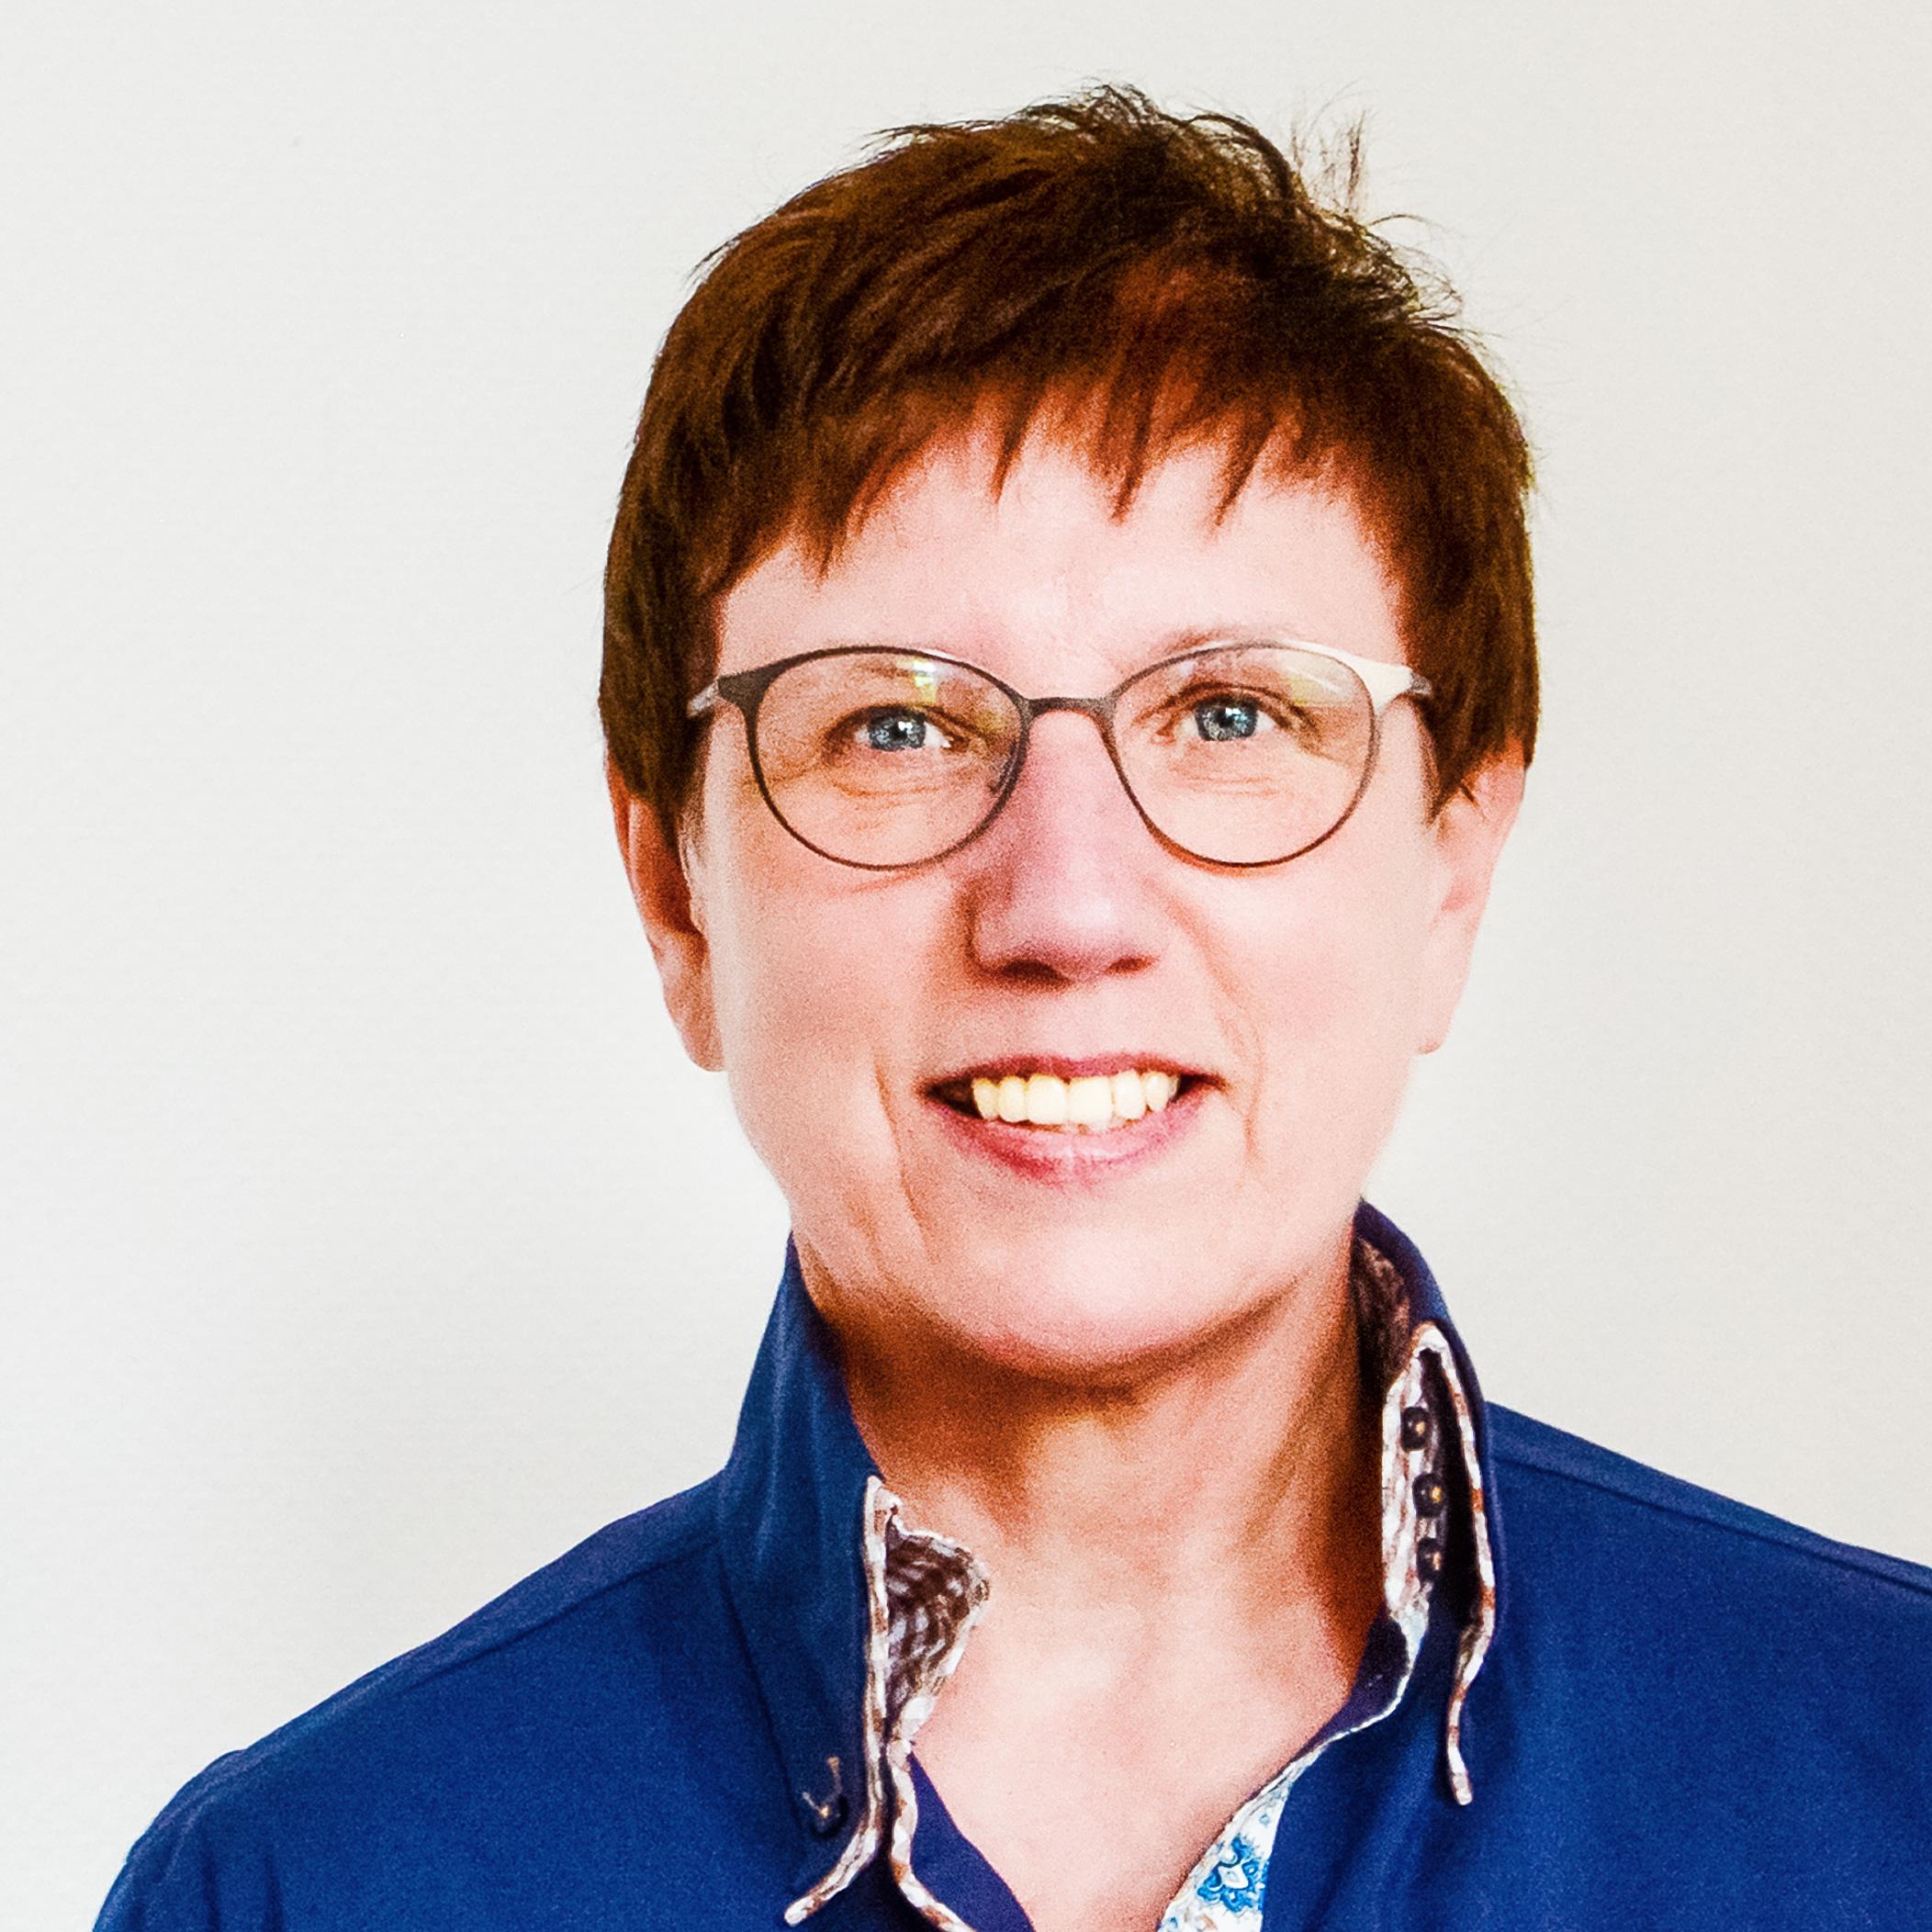 ELENA MUSSHOFF